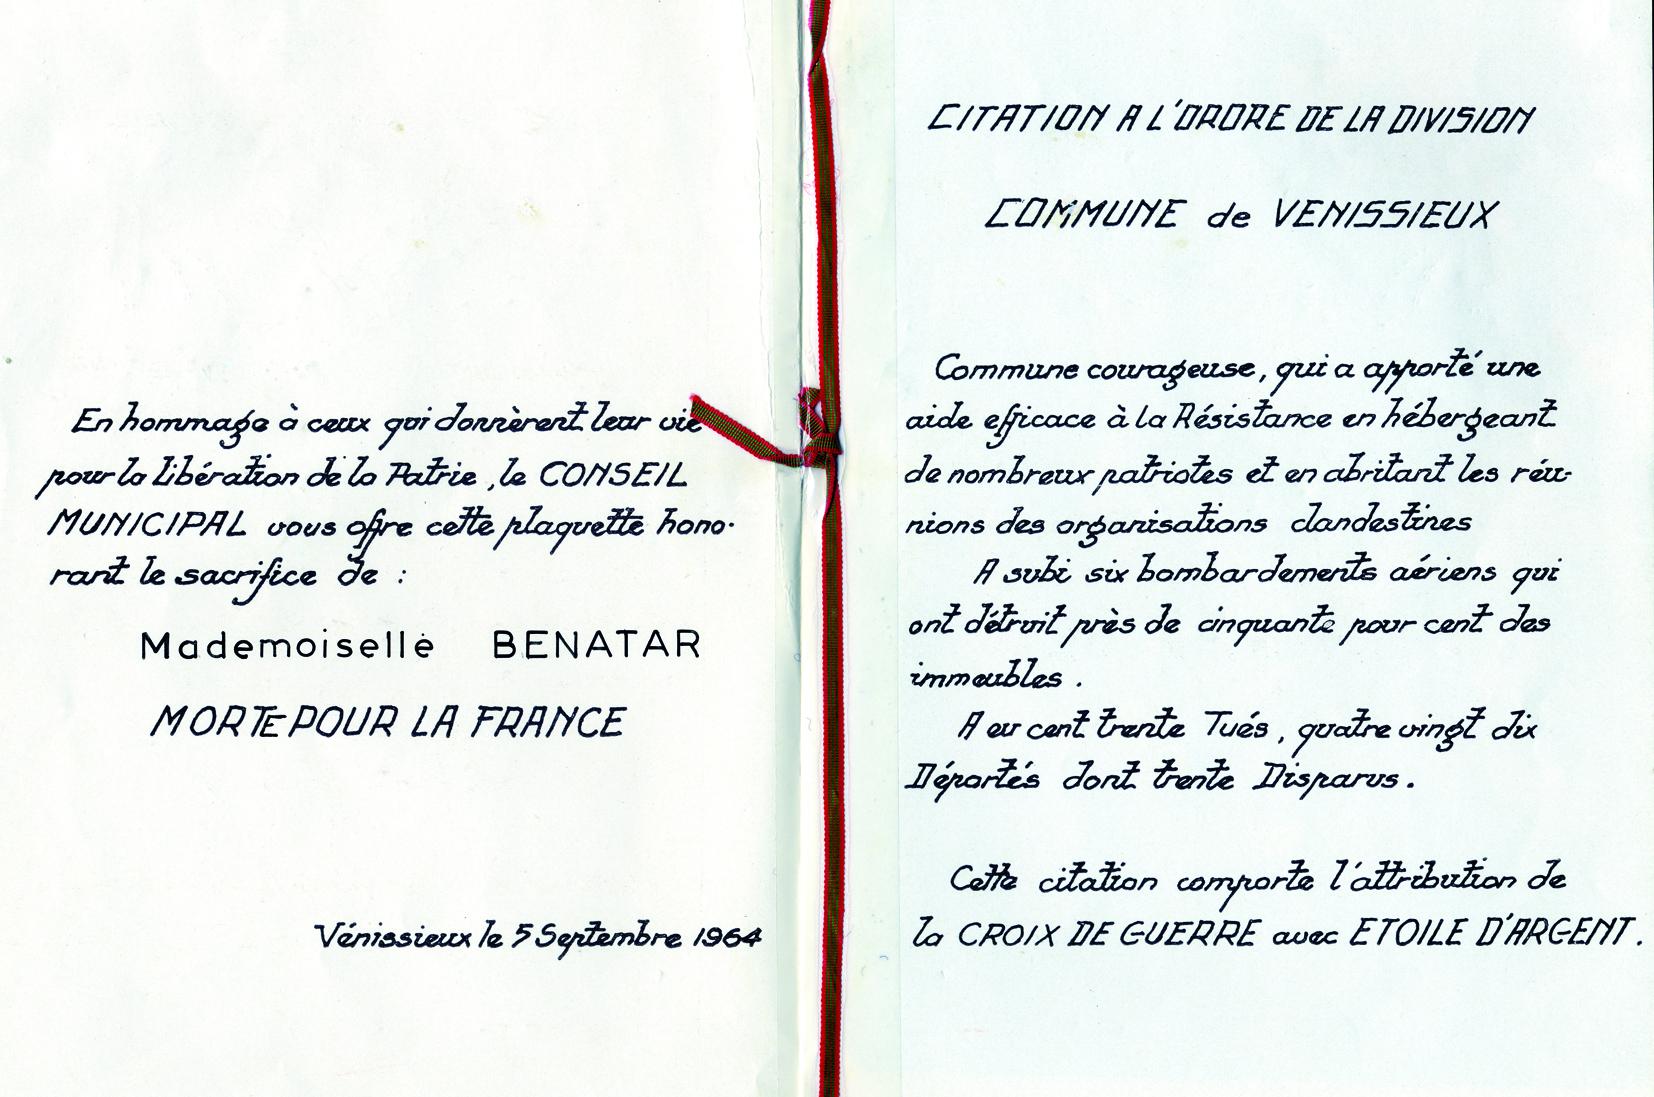 Benatar / Saint-Fons